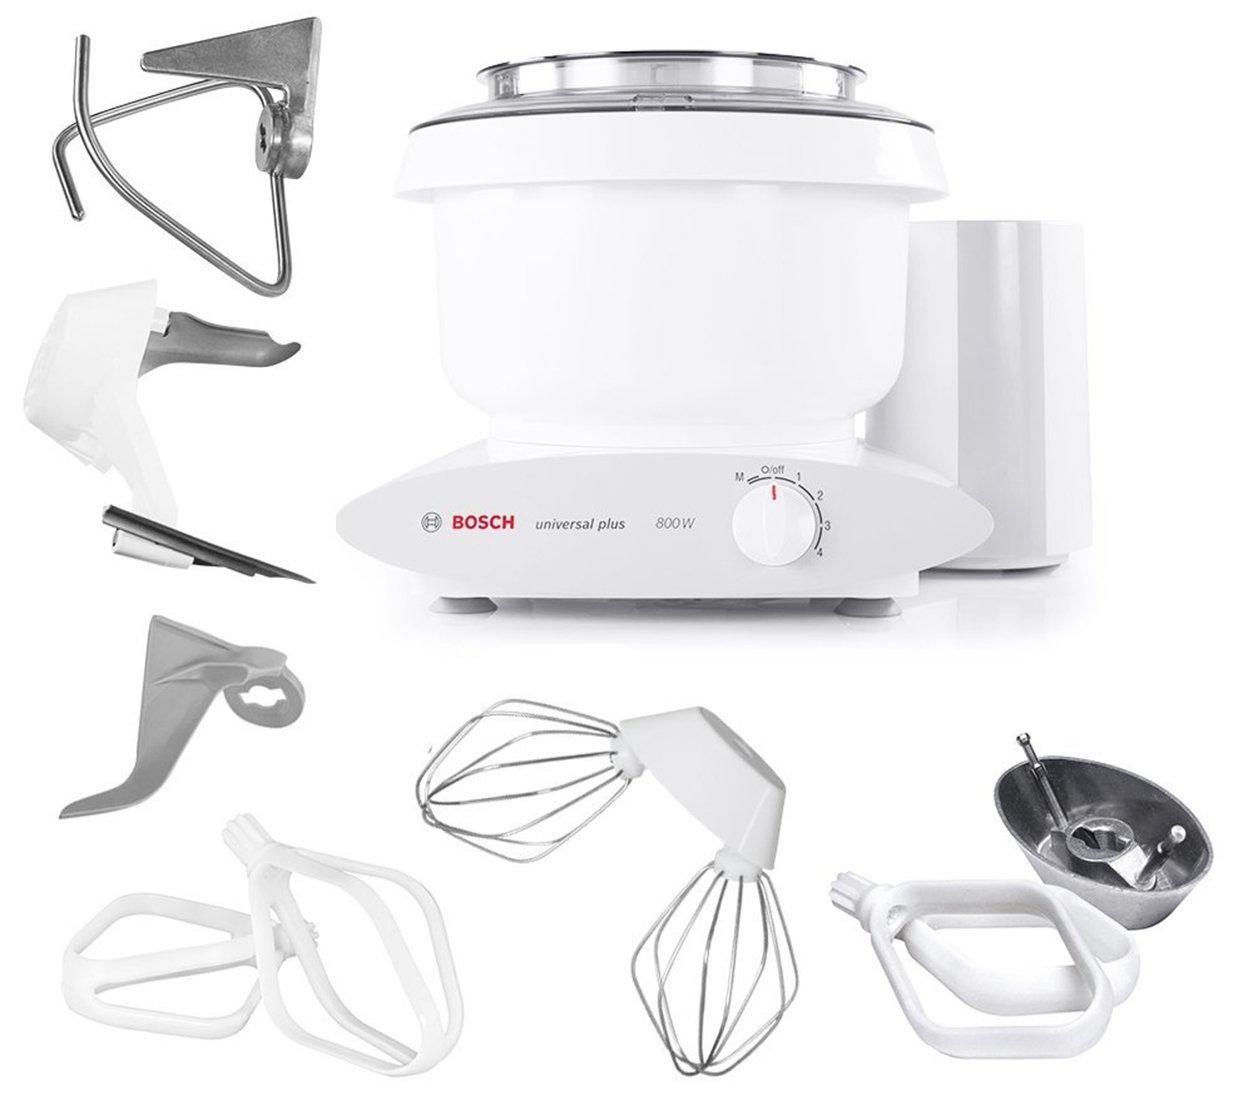 Bosch MUM6N10UC Universal Plus Stand Mixer, 800 Watt, 6.5-Quarts with Bowl Scraper and Cake Paddles